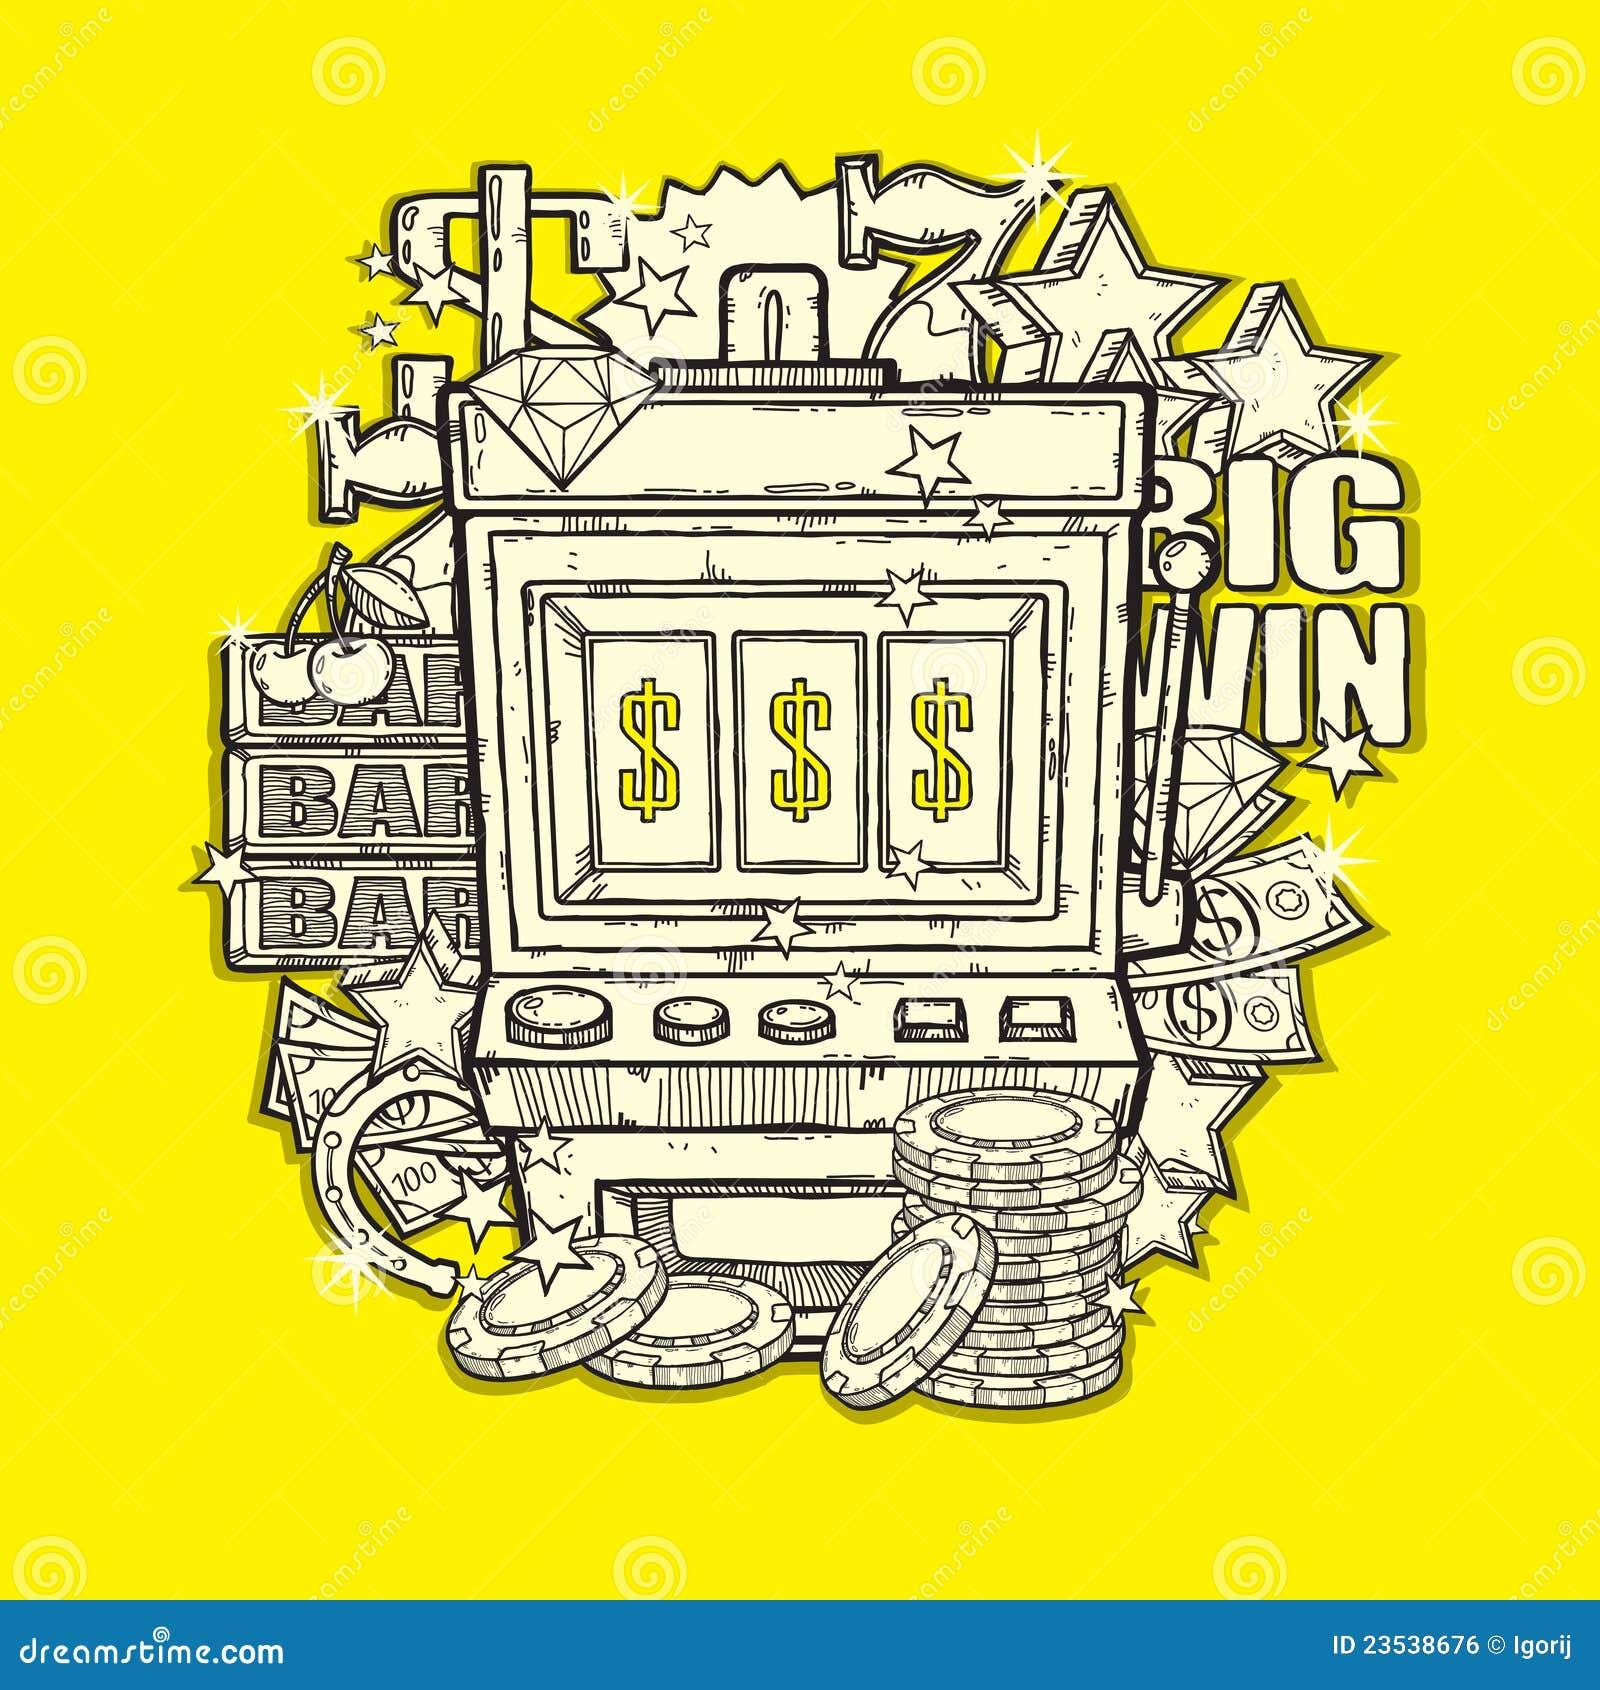 slot machine royalty free stock image image 23538676. Black Bedroom Furniture Sets. Home Design Ideas